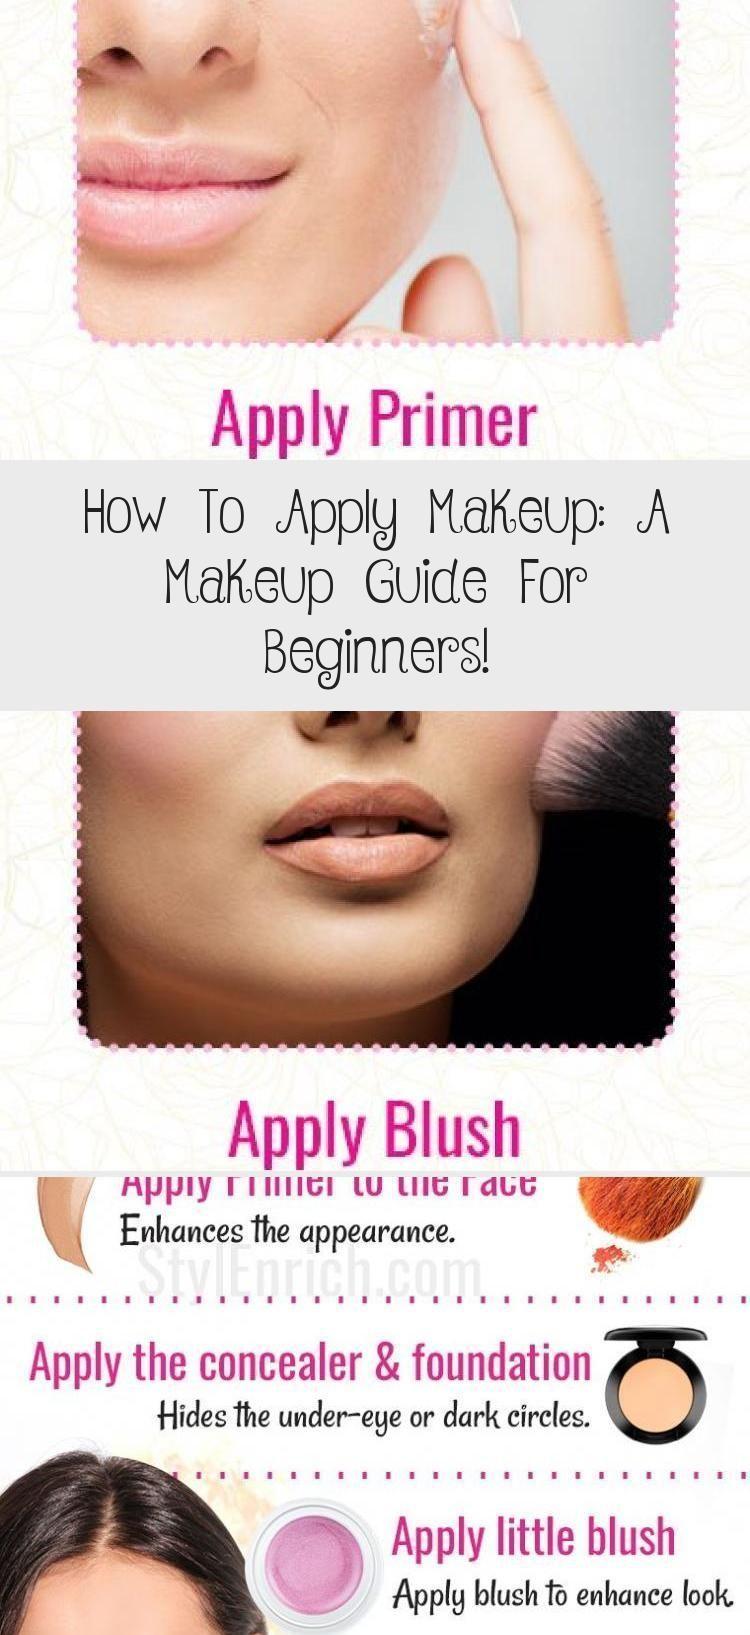 Steps To Apply Makeup For Beginners Makeup Vidalondon Dark Smokey Eye Smokey Eye Makeup Smokey Eye Tutorial